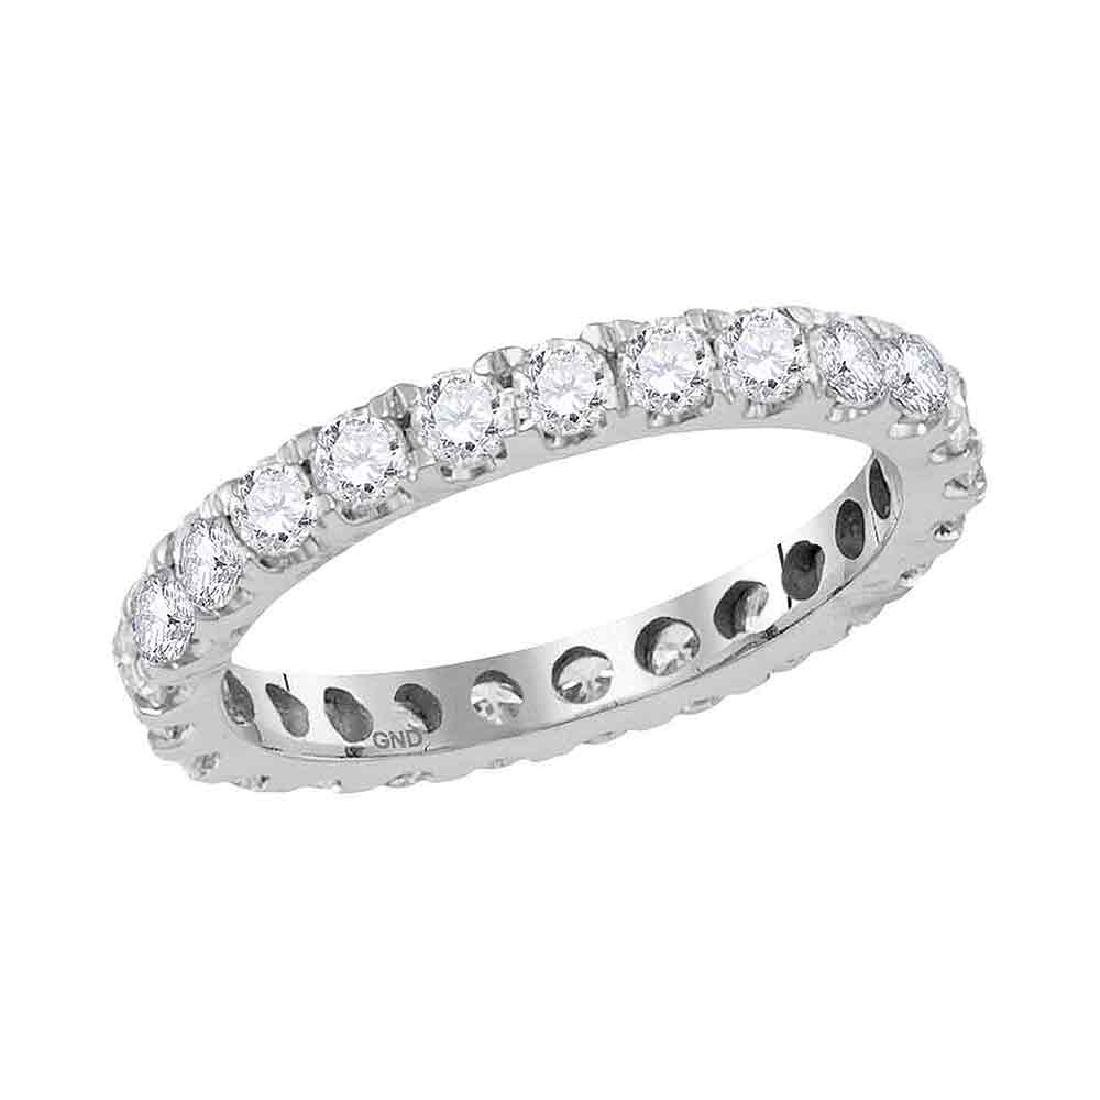 1.5 CTW Diamond Eternity Anniversary Ring 14KT White